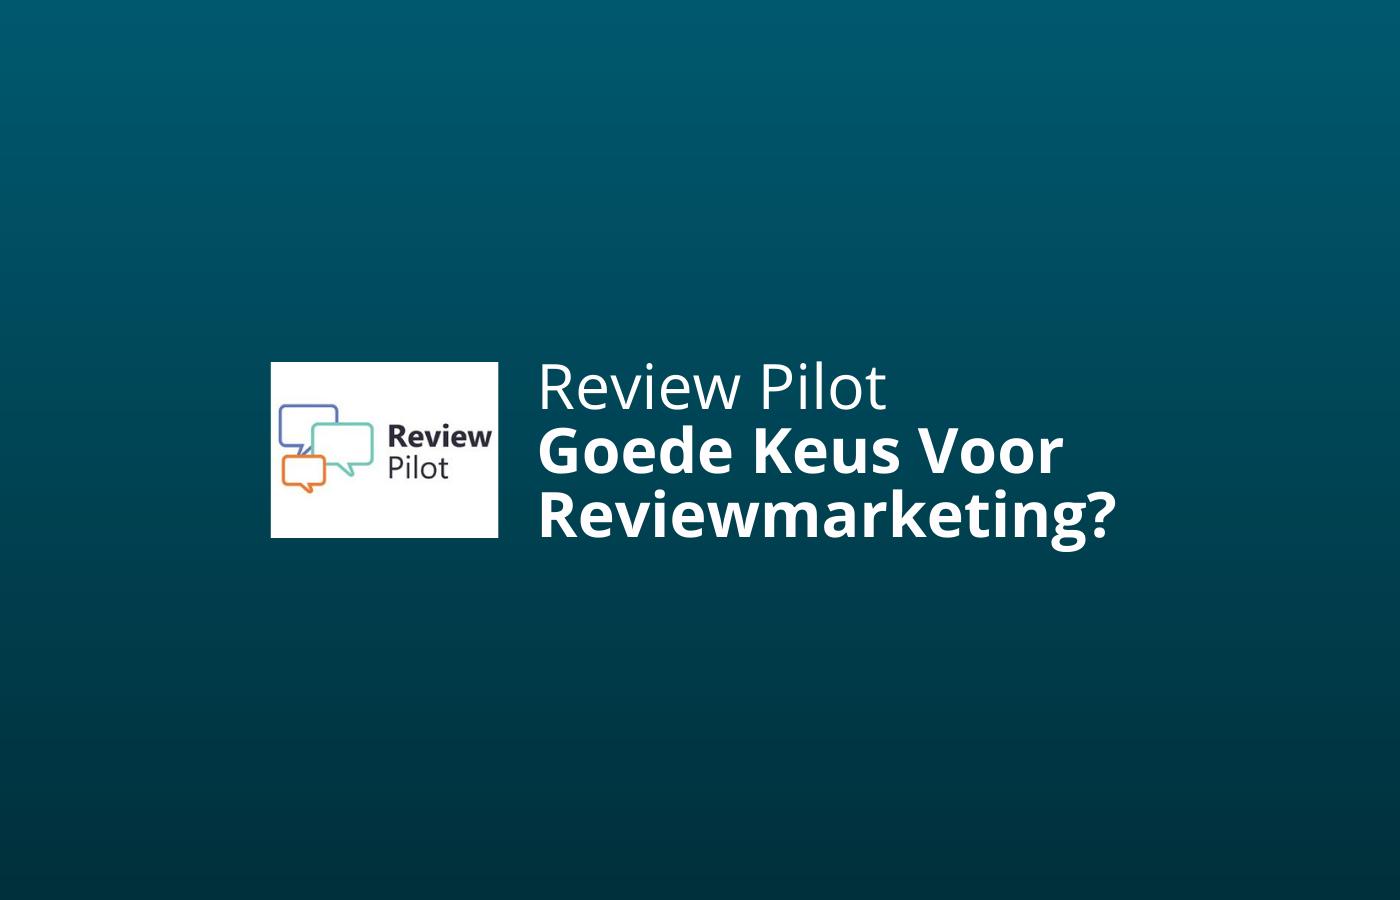 reviewpilot review en ervaringen